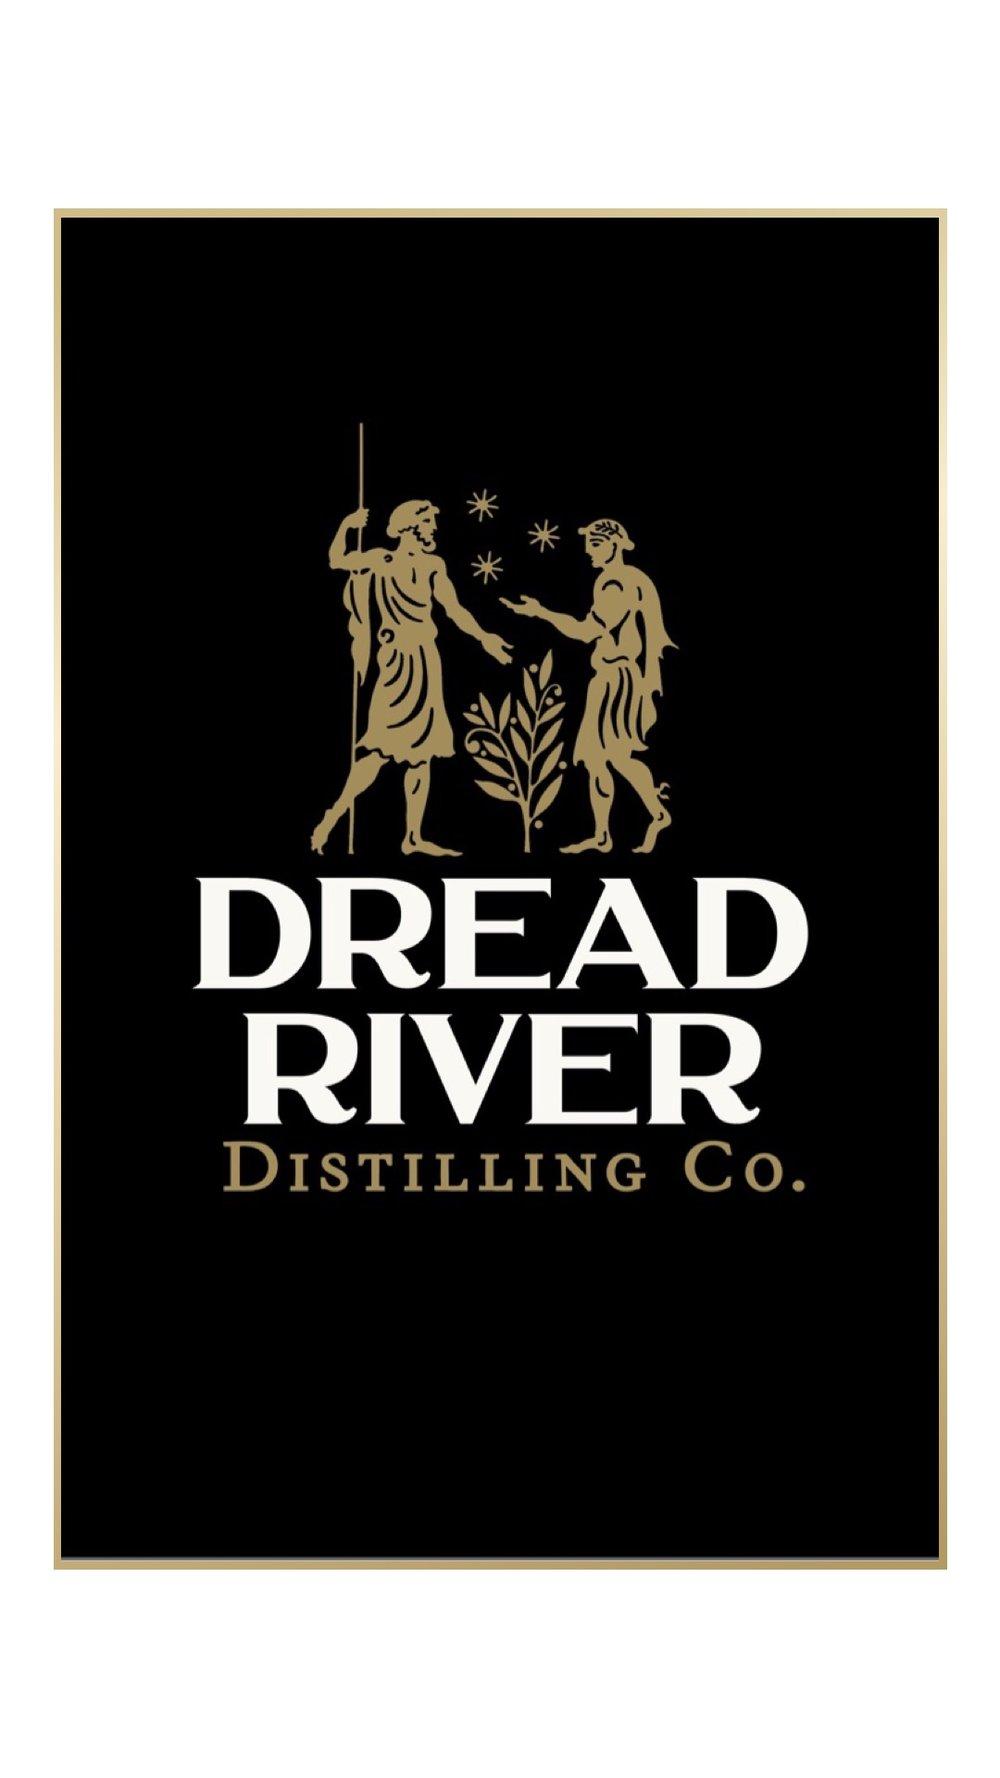 Dread_River_logo.jpeg